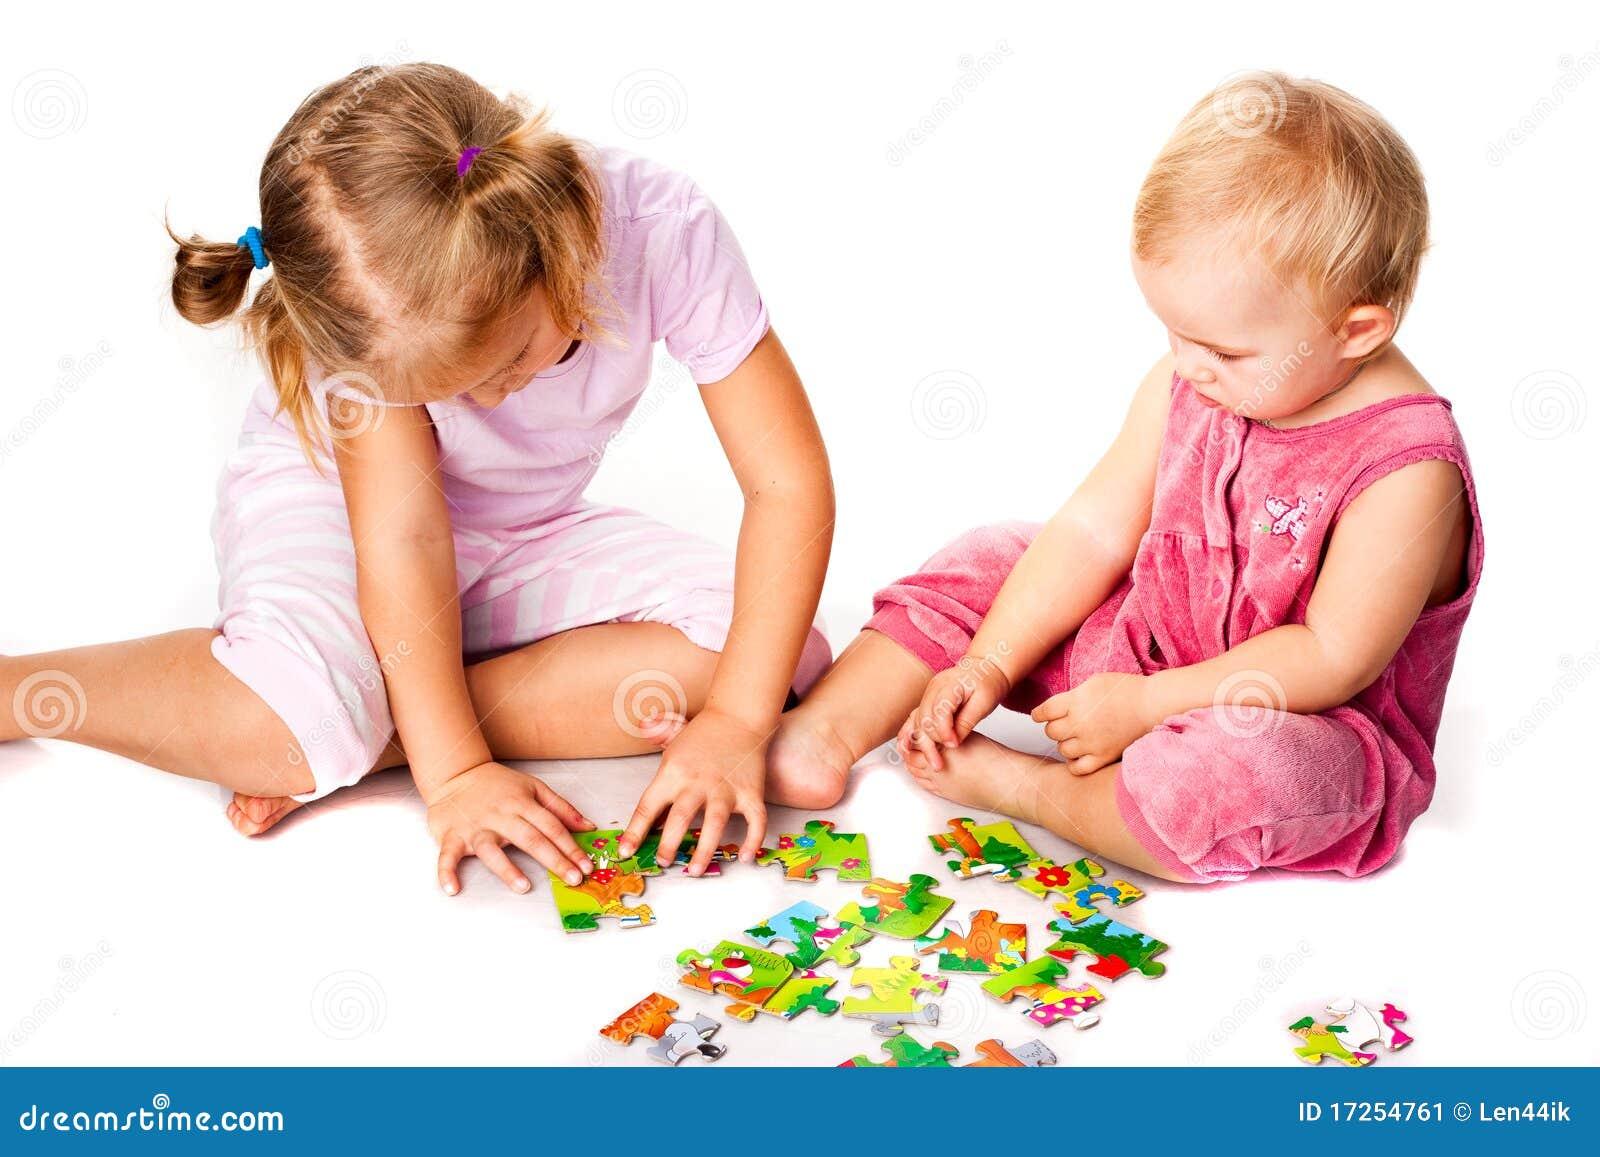 Children Solving Jigsaw Puzzle Stock Image - Image: 17254761